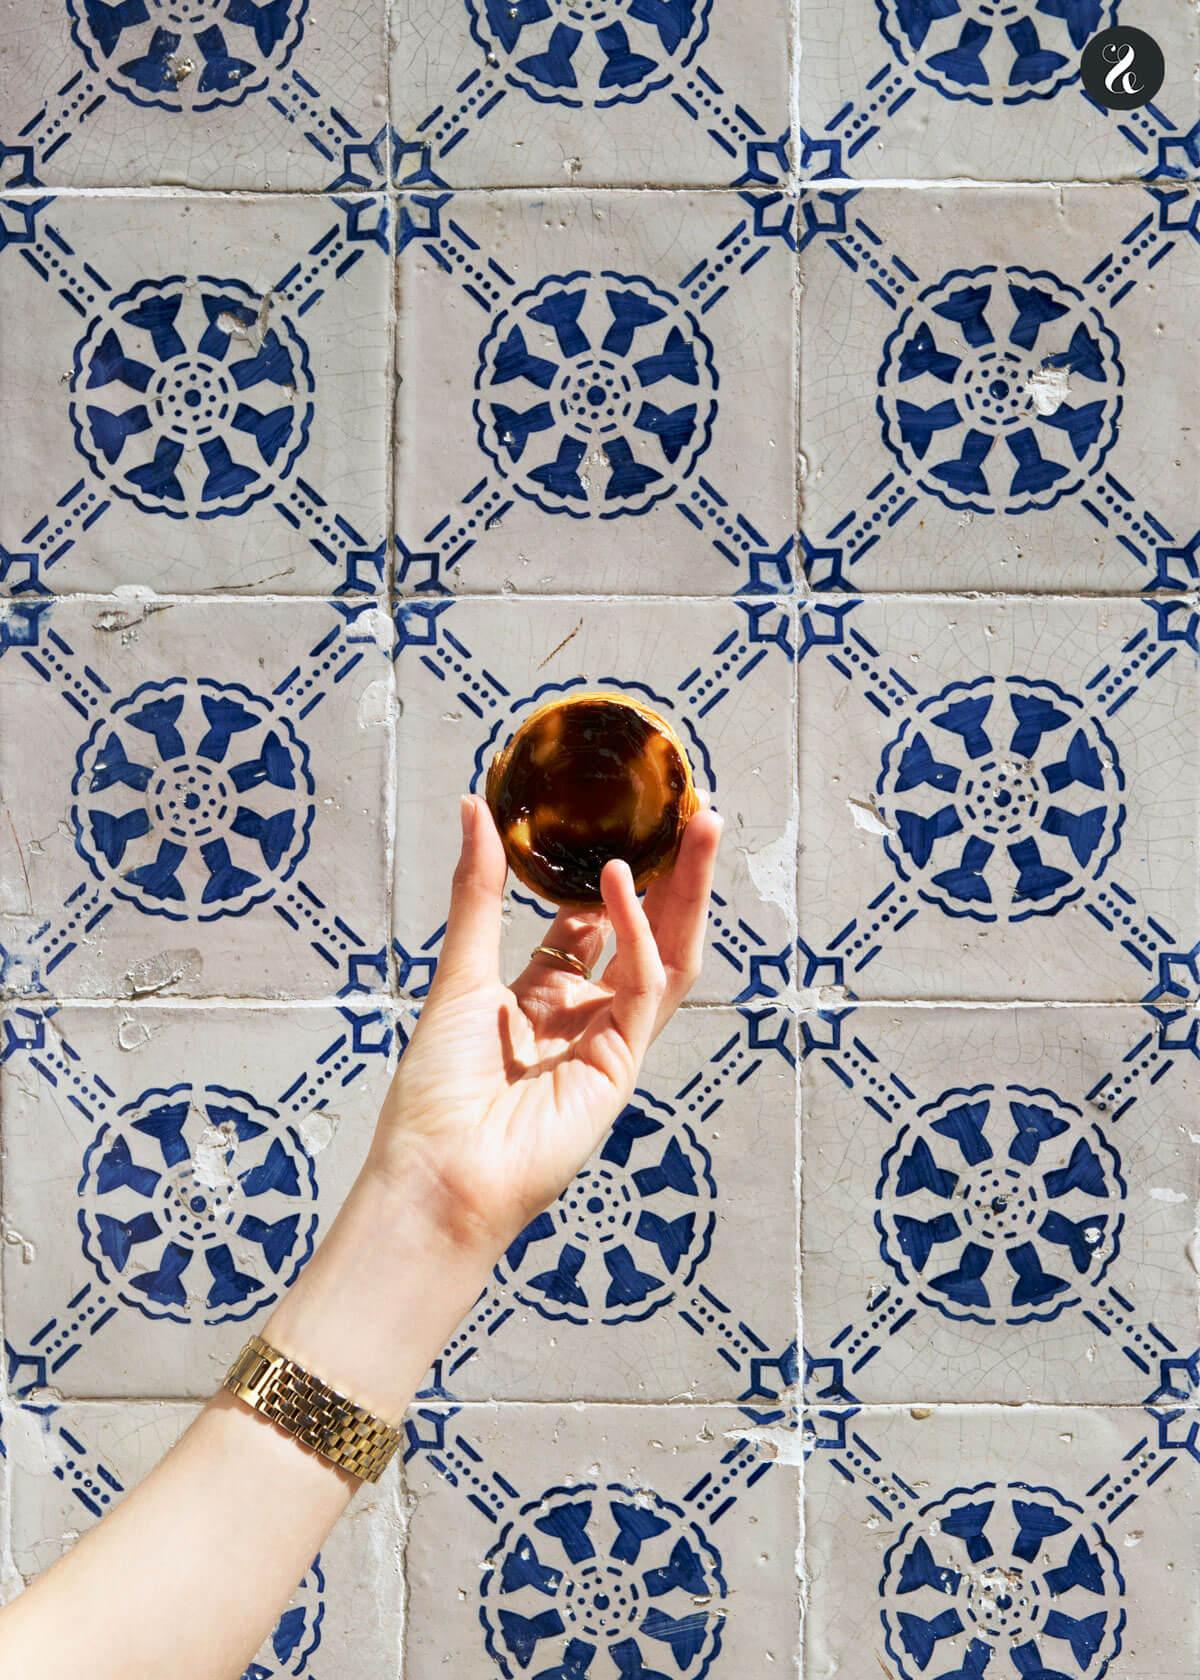 Qué ver en Lisboa - Fabrica de pasteles de nata